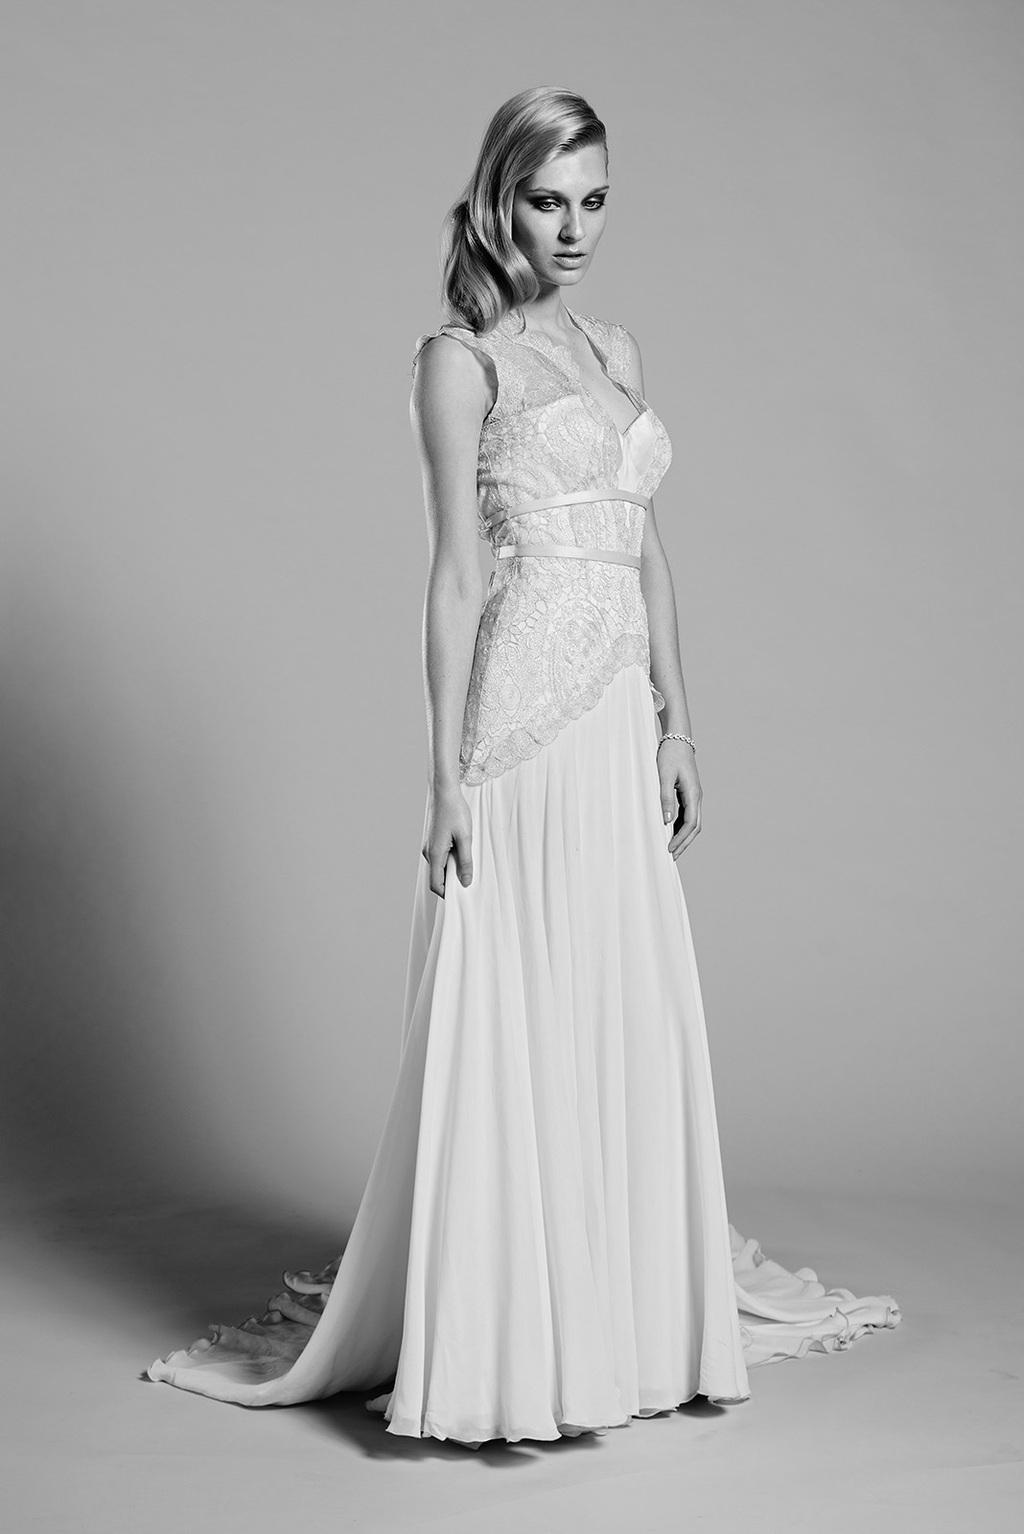 Lilac wedding dress by mariana hardwick 2014 bridal for Lilac dress for wedding